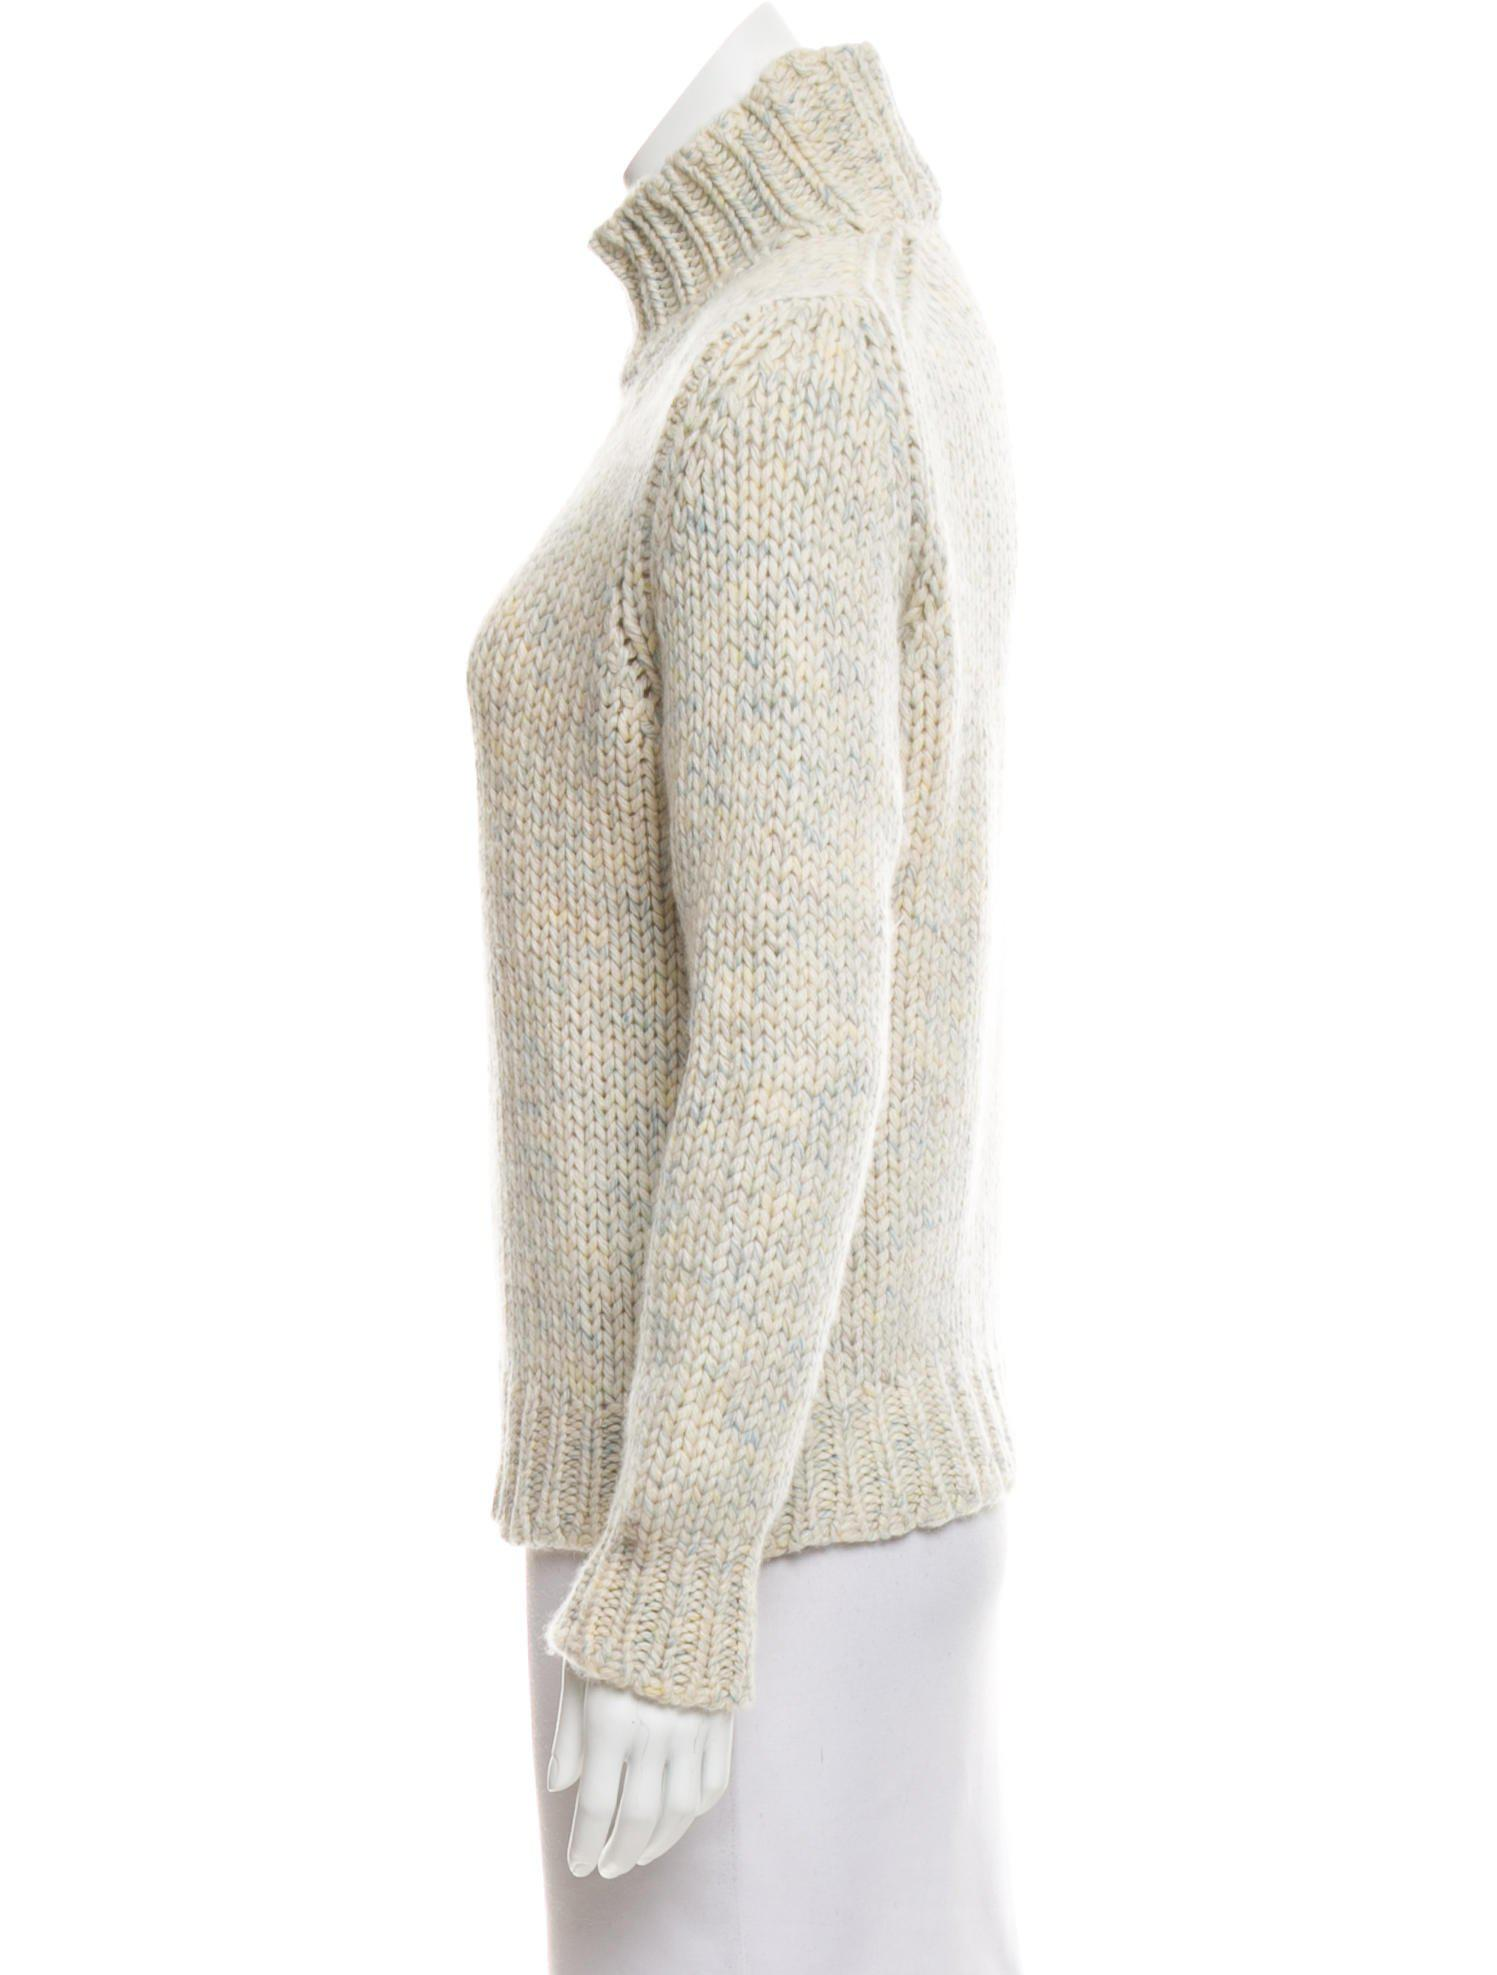 Loro piana Cashmere Turtleneck Sweater in Yellow   Lyst